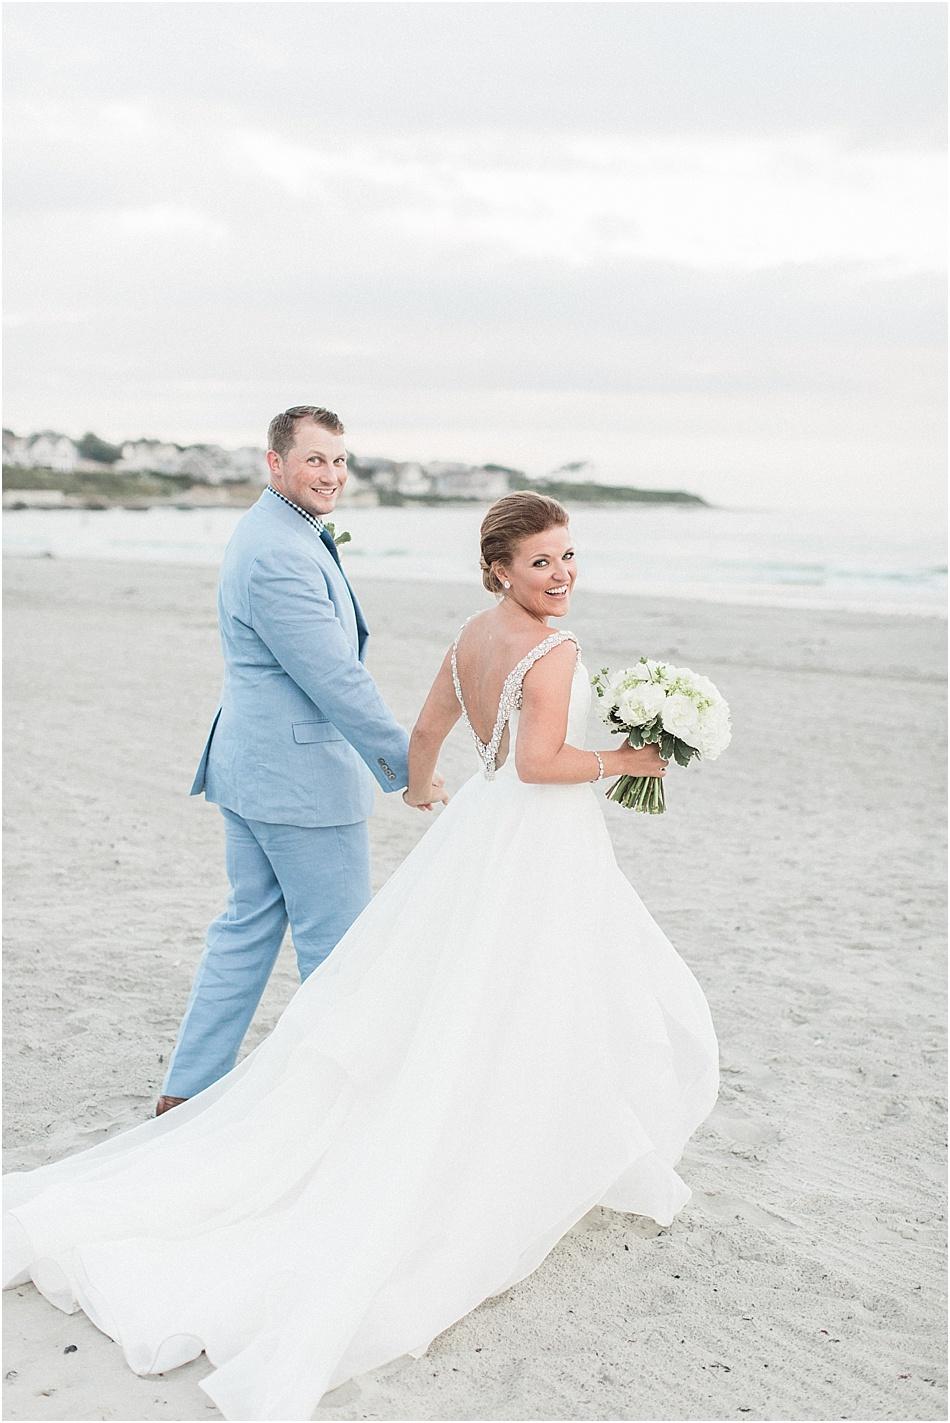 kyndra_matt_newport_beach_house_rhode_island_striped_bridesmaids_dresses_cape_cod_boston_wedding_photographer_Meredith_Jane_Photography_photo_0210.jpg